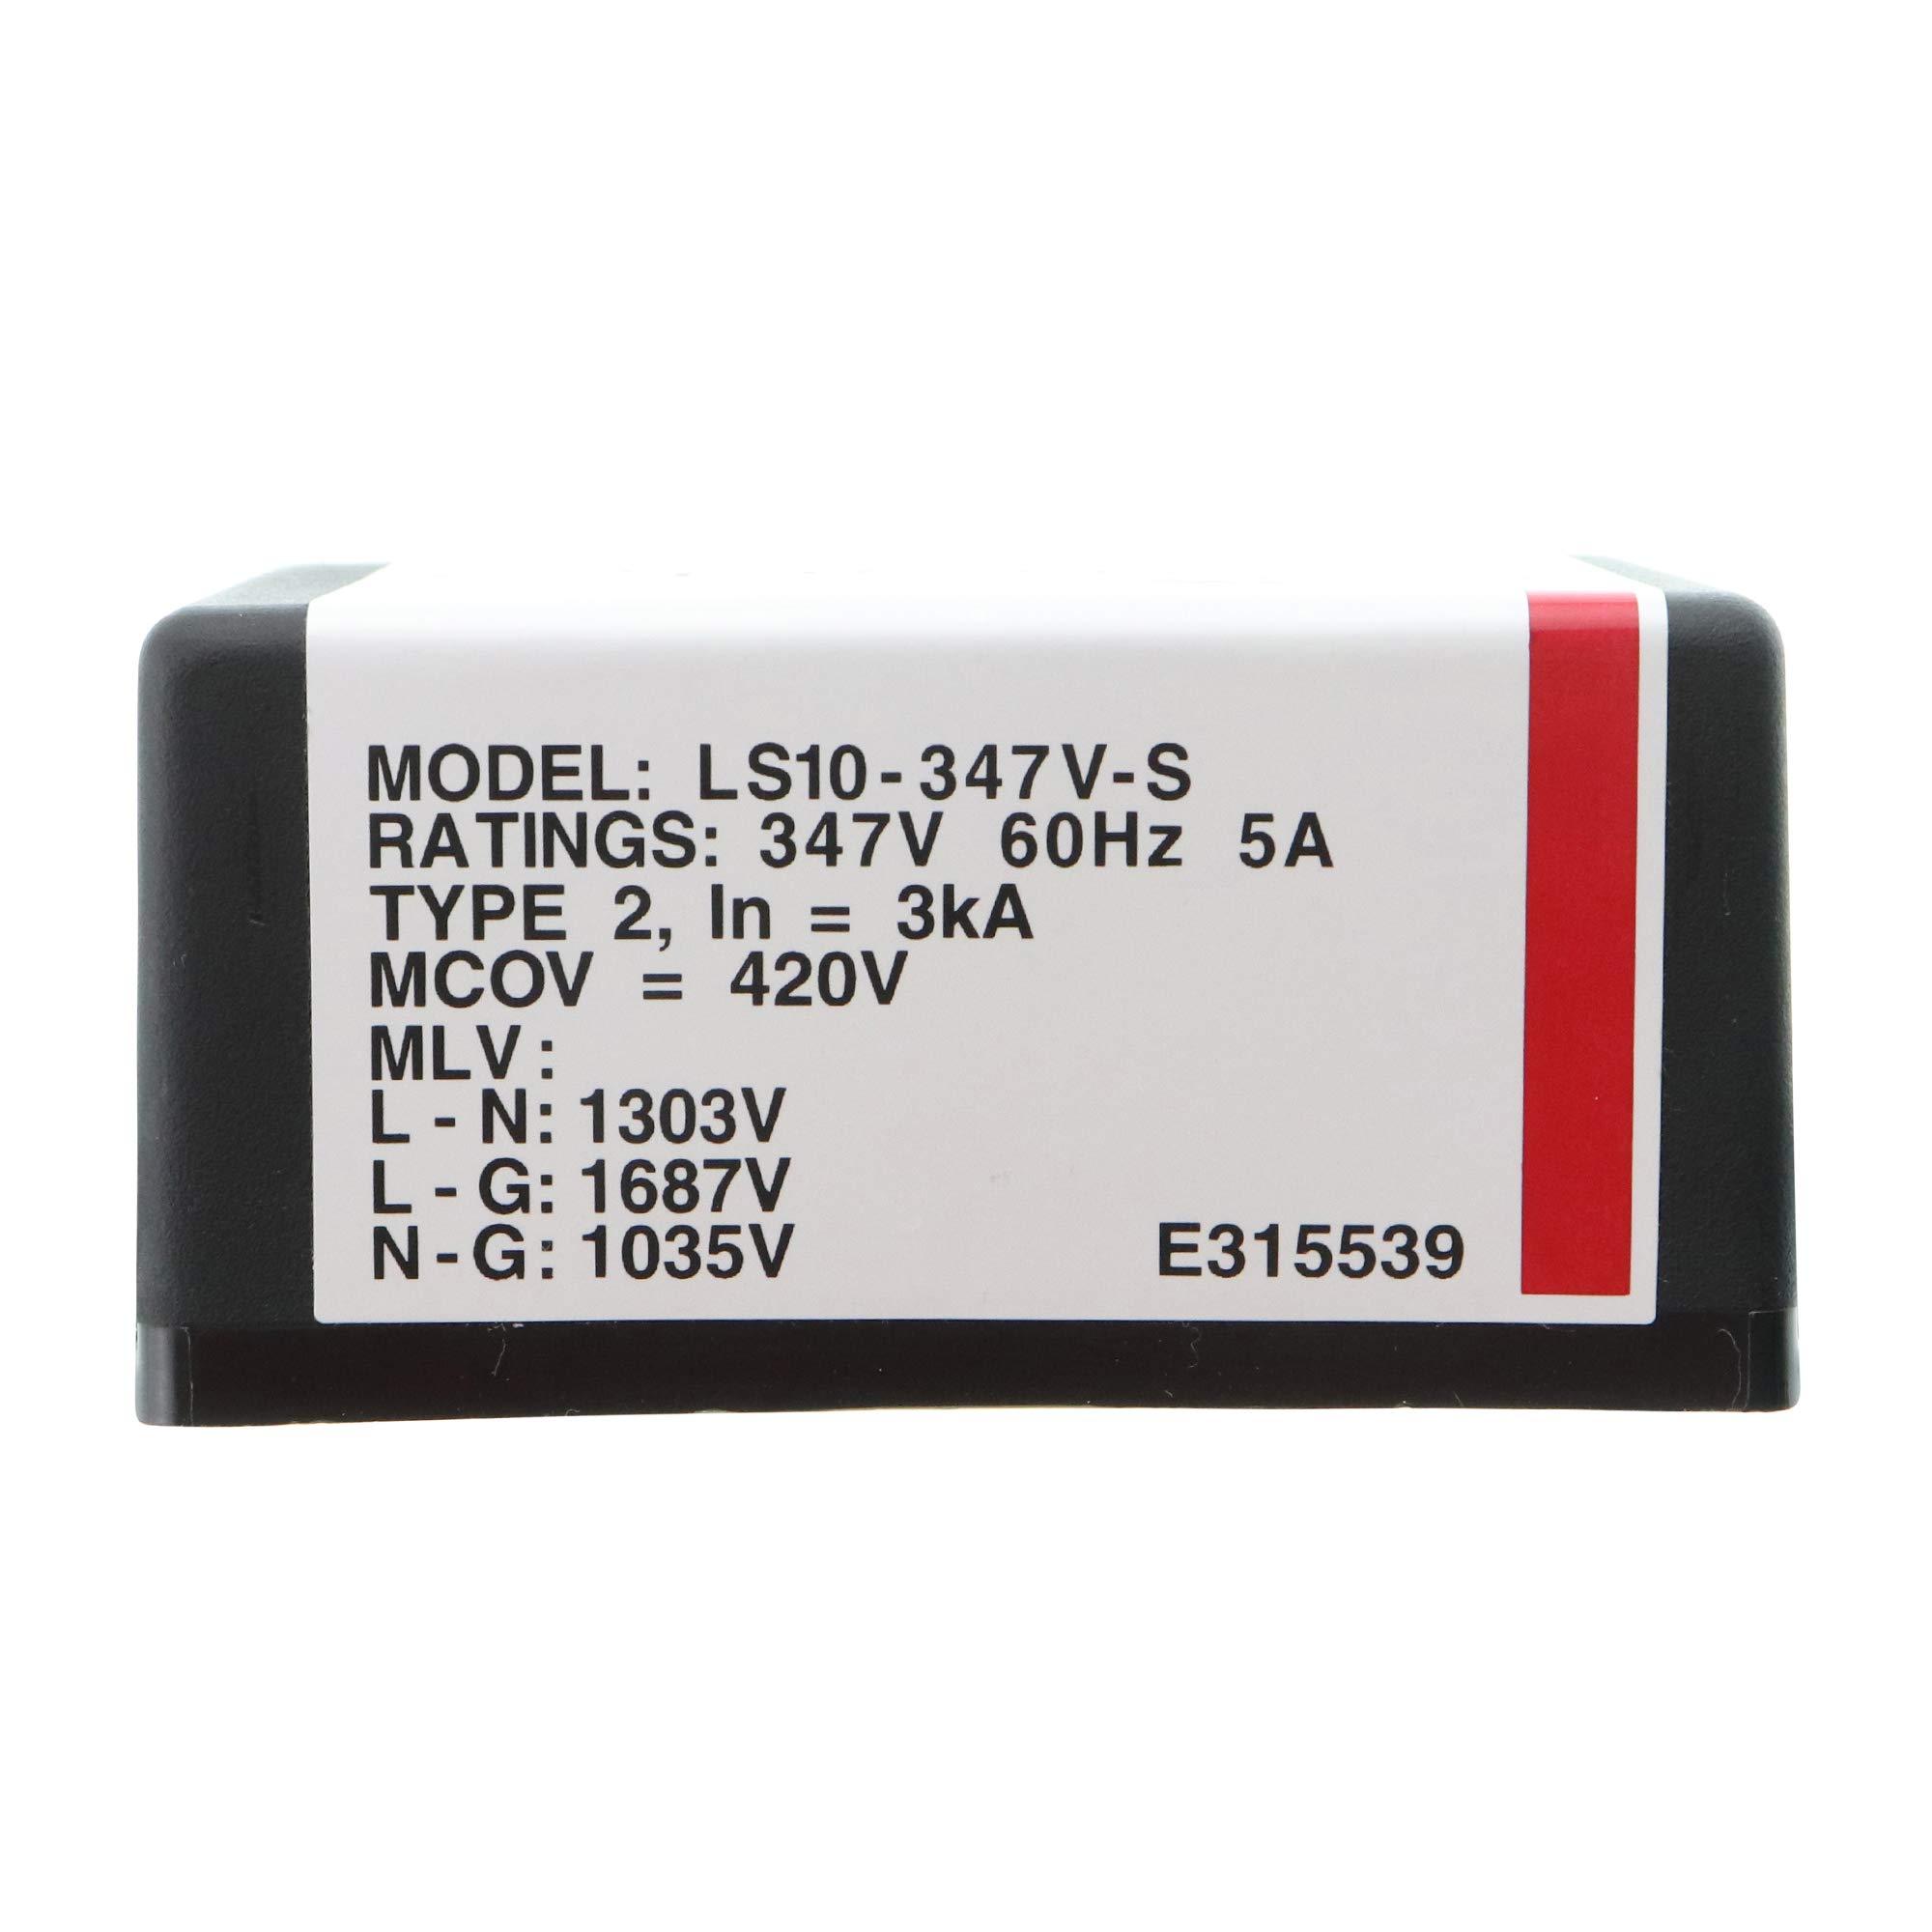 Cooper Lighting LS10-347V-S LED Lighting Surge Protector SPD, TVSS, 120-347V